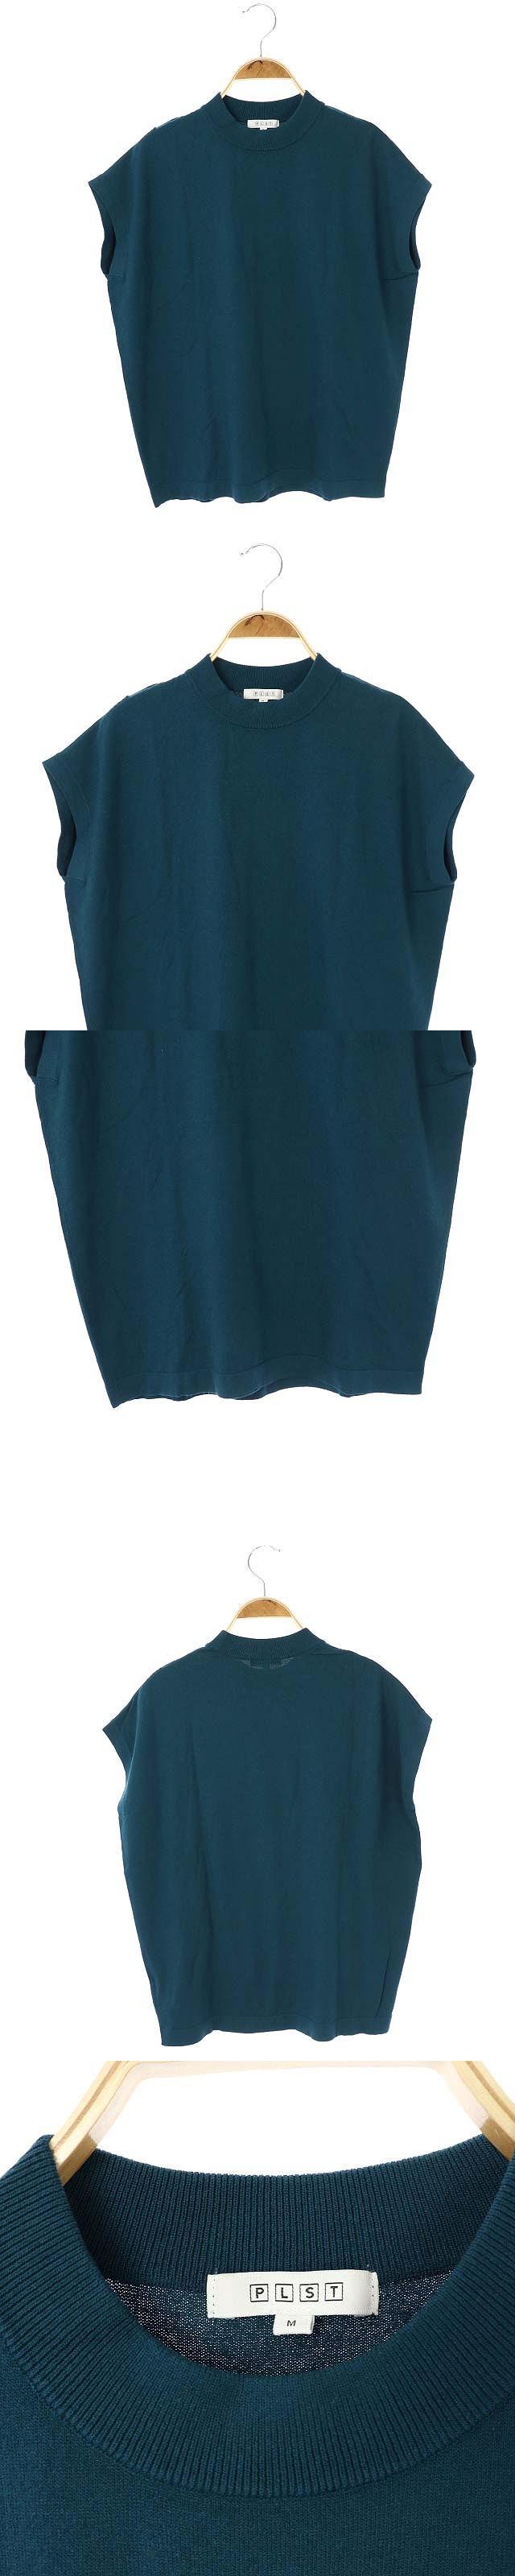 19AW クルーネックサマーニット カットソー 半袖 フレンチスリーブ M 深緑 ダークグリーン /ES ■OS